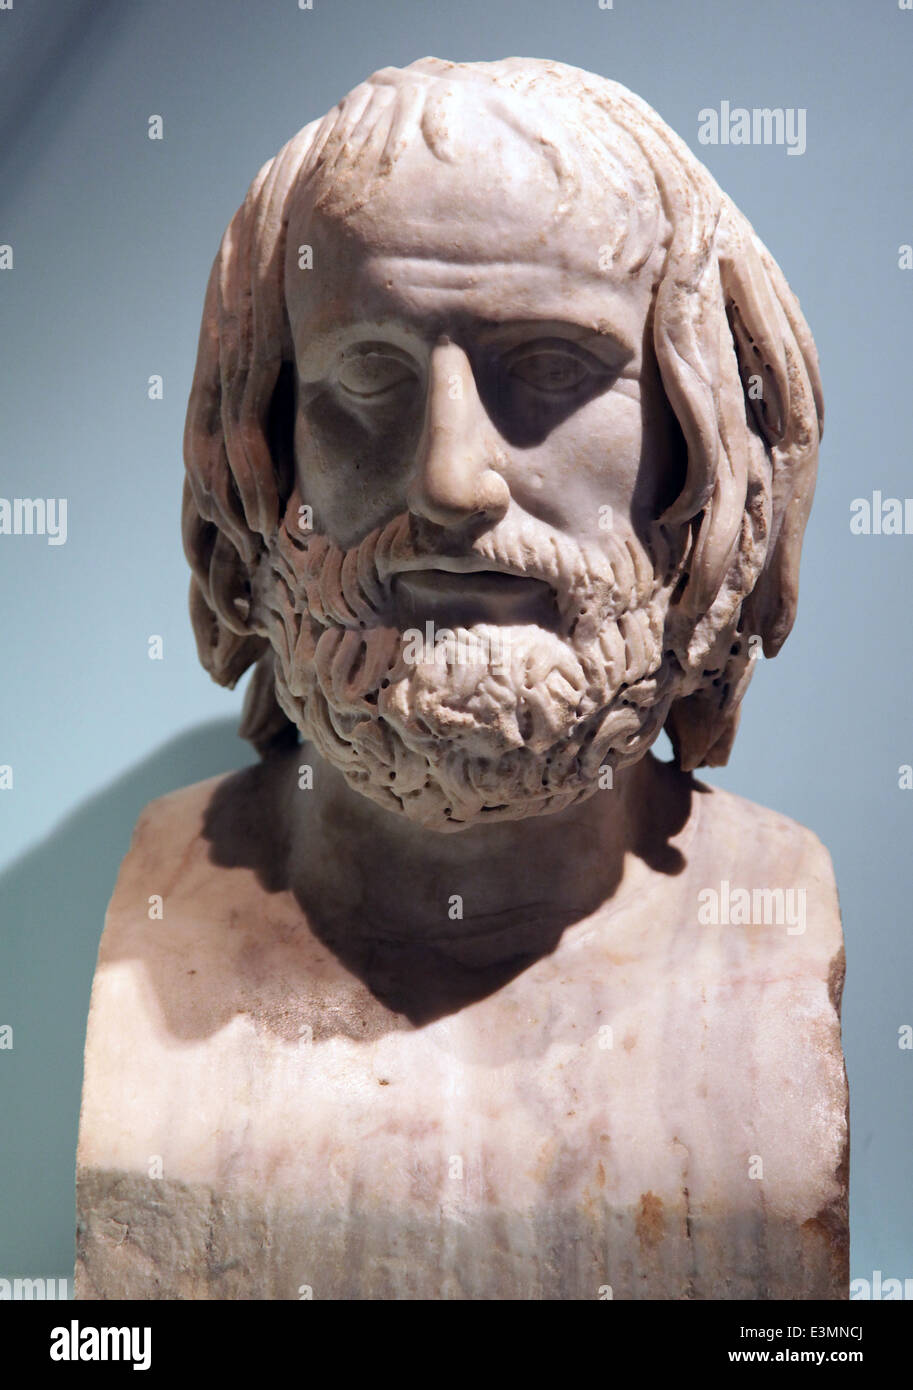 Portrait figure of Euripides 480-406 b.c. - Stock Image